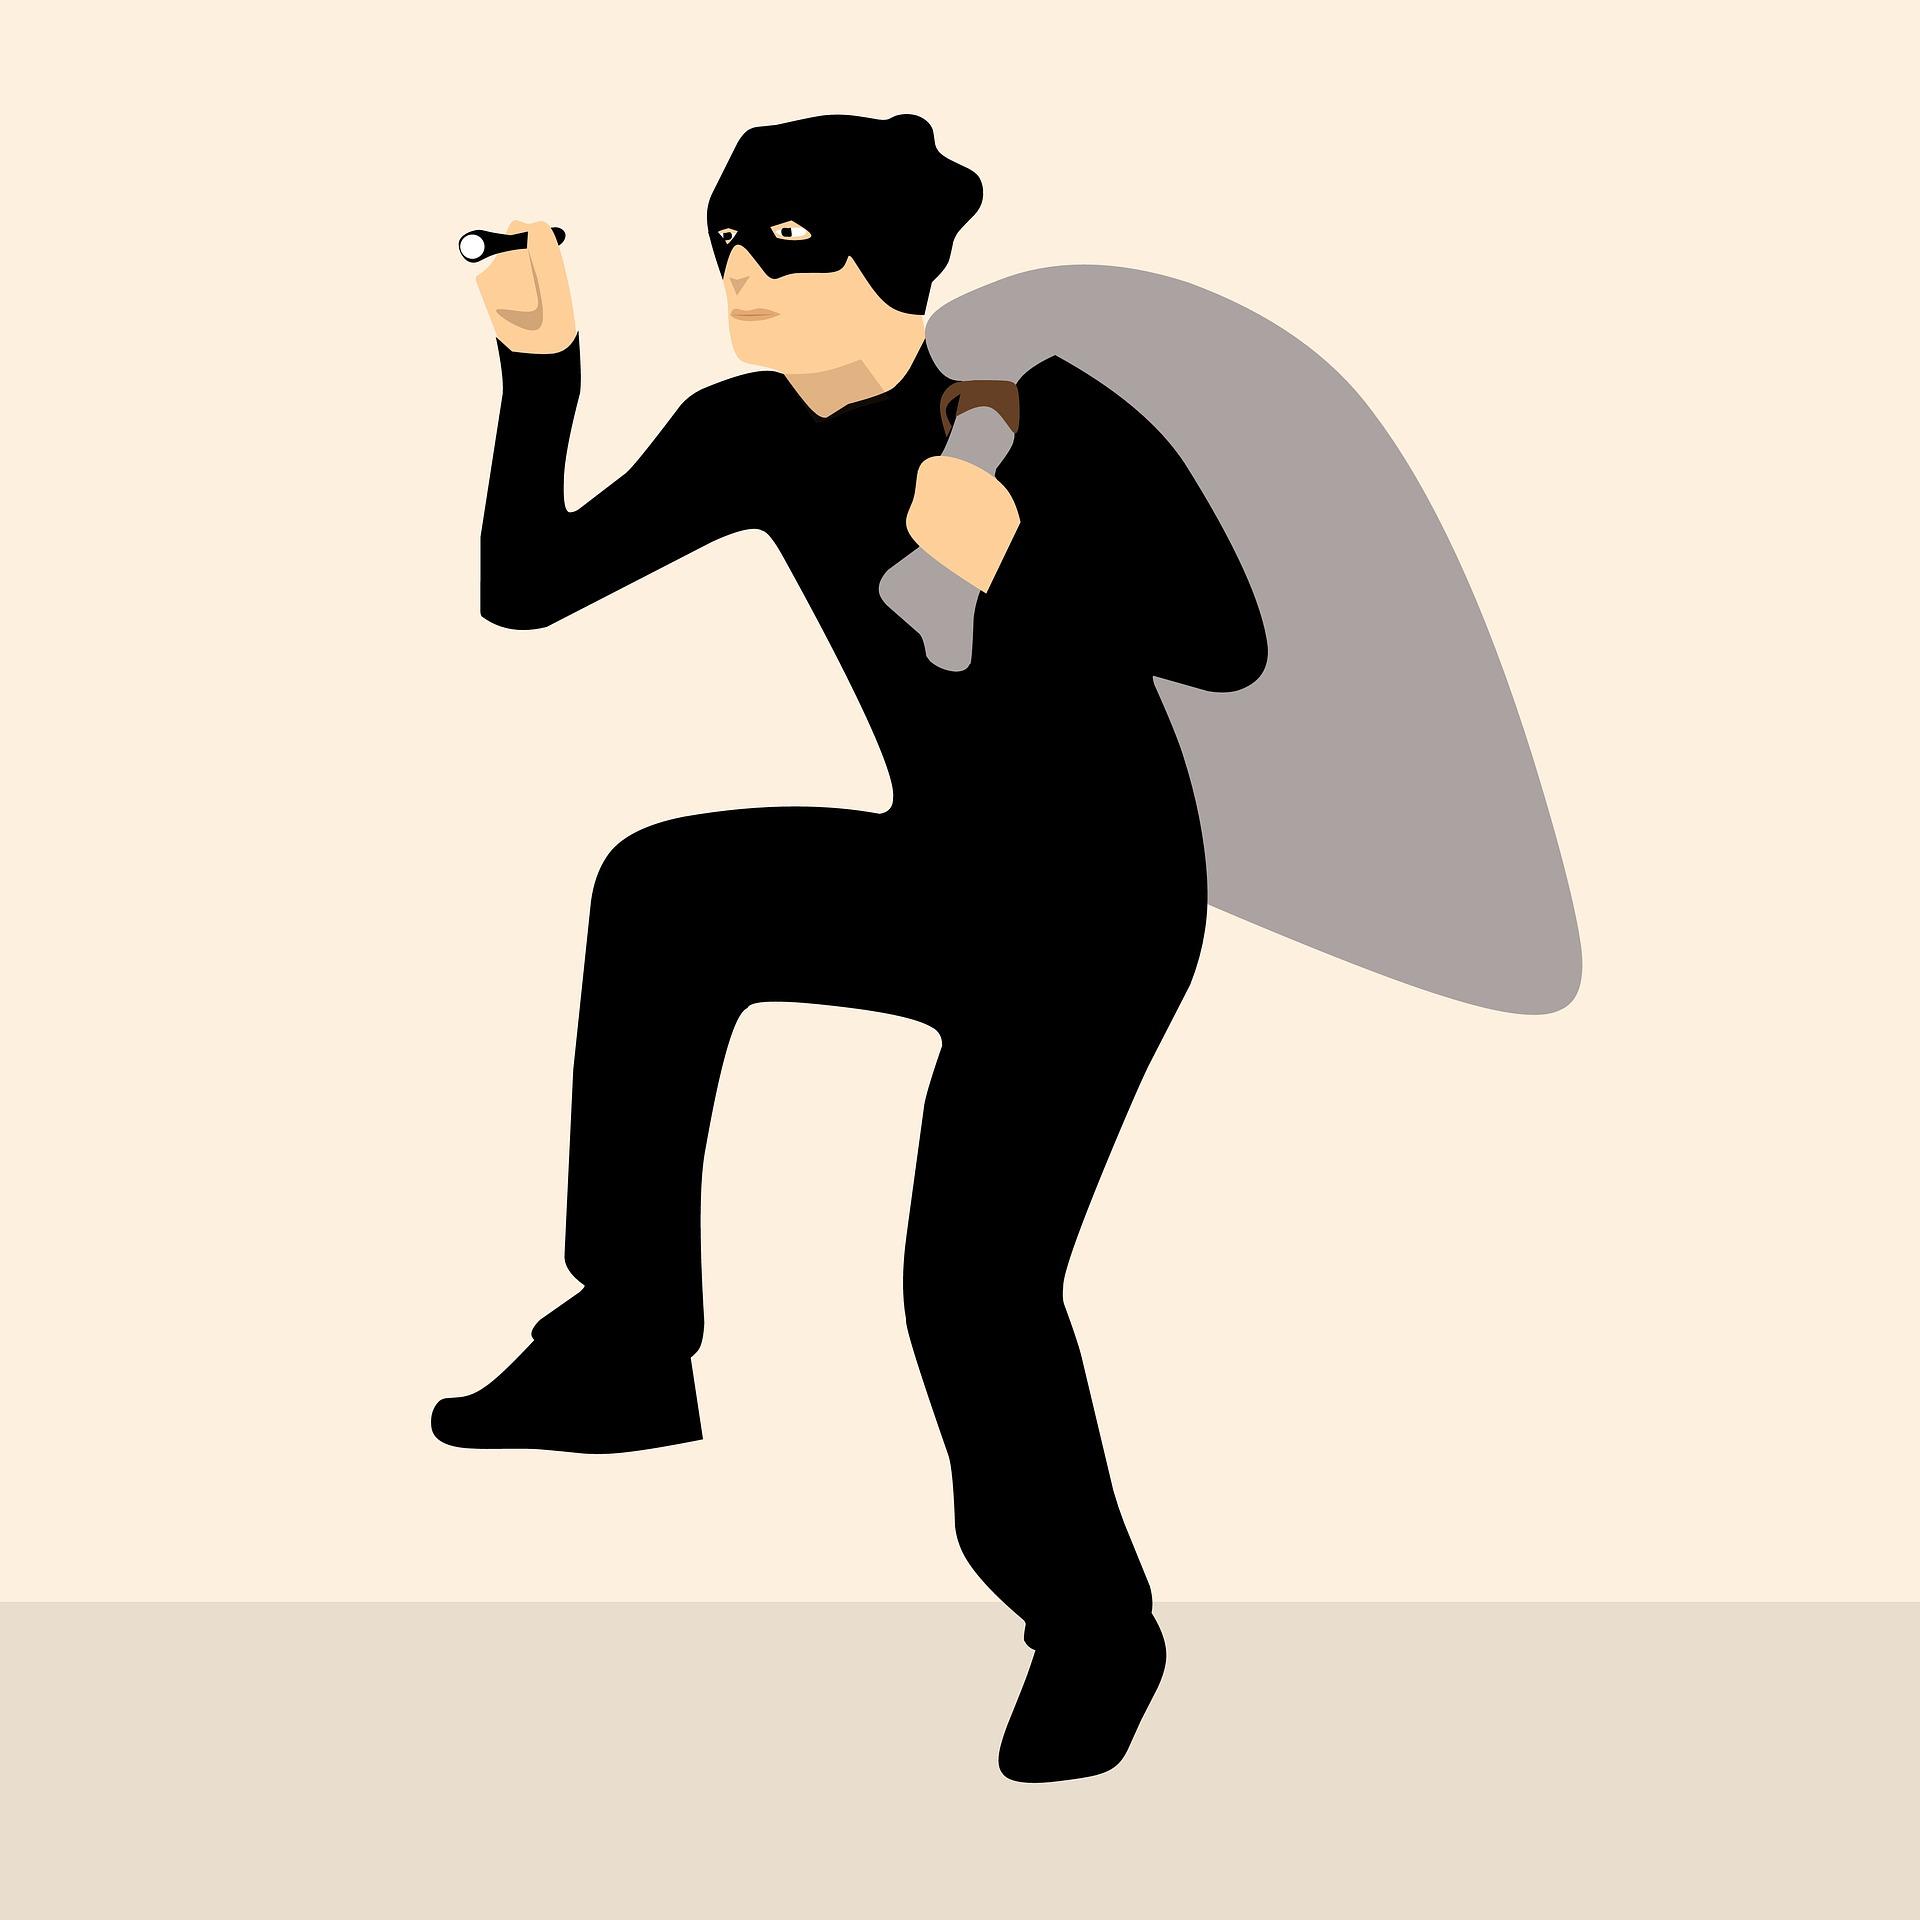 Pixabay_cartoon-character-2934389_1920